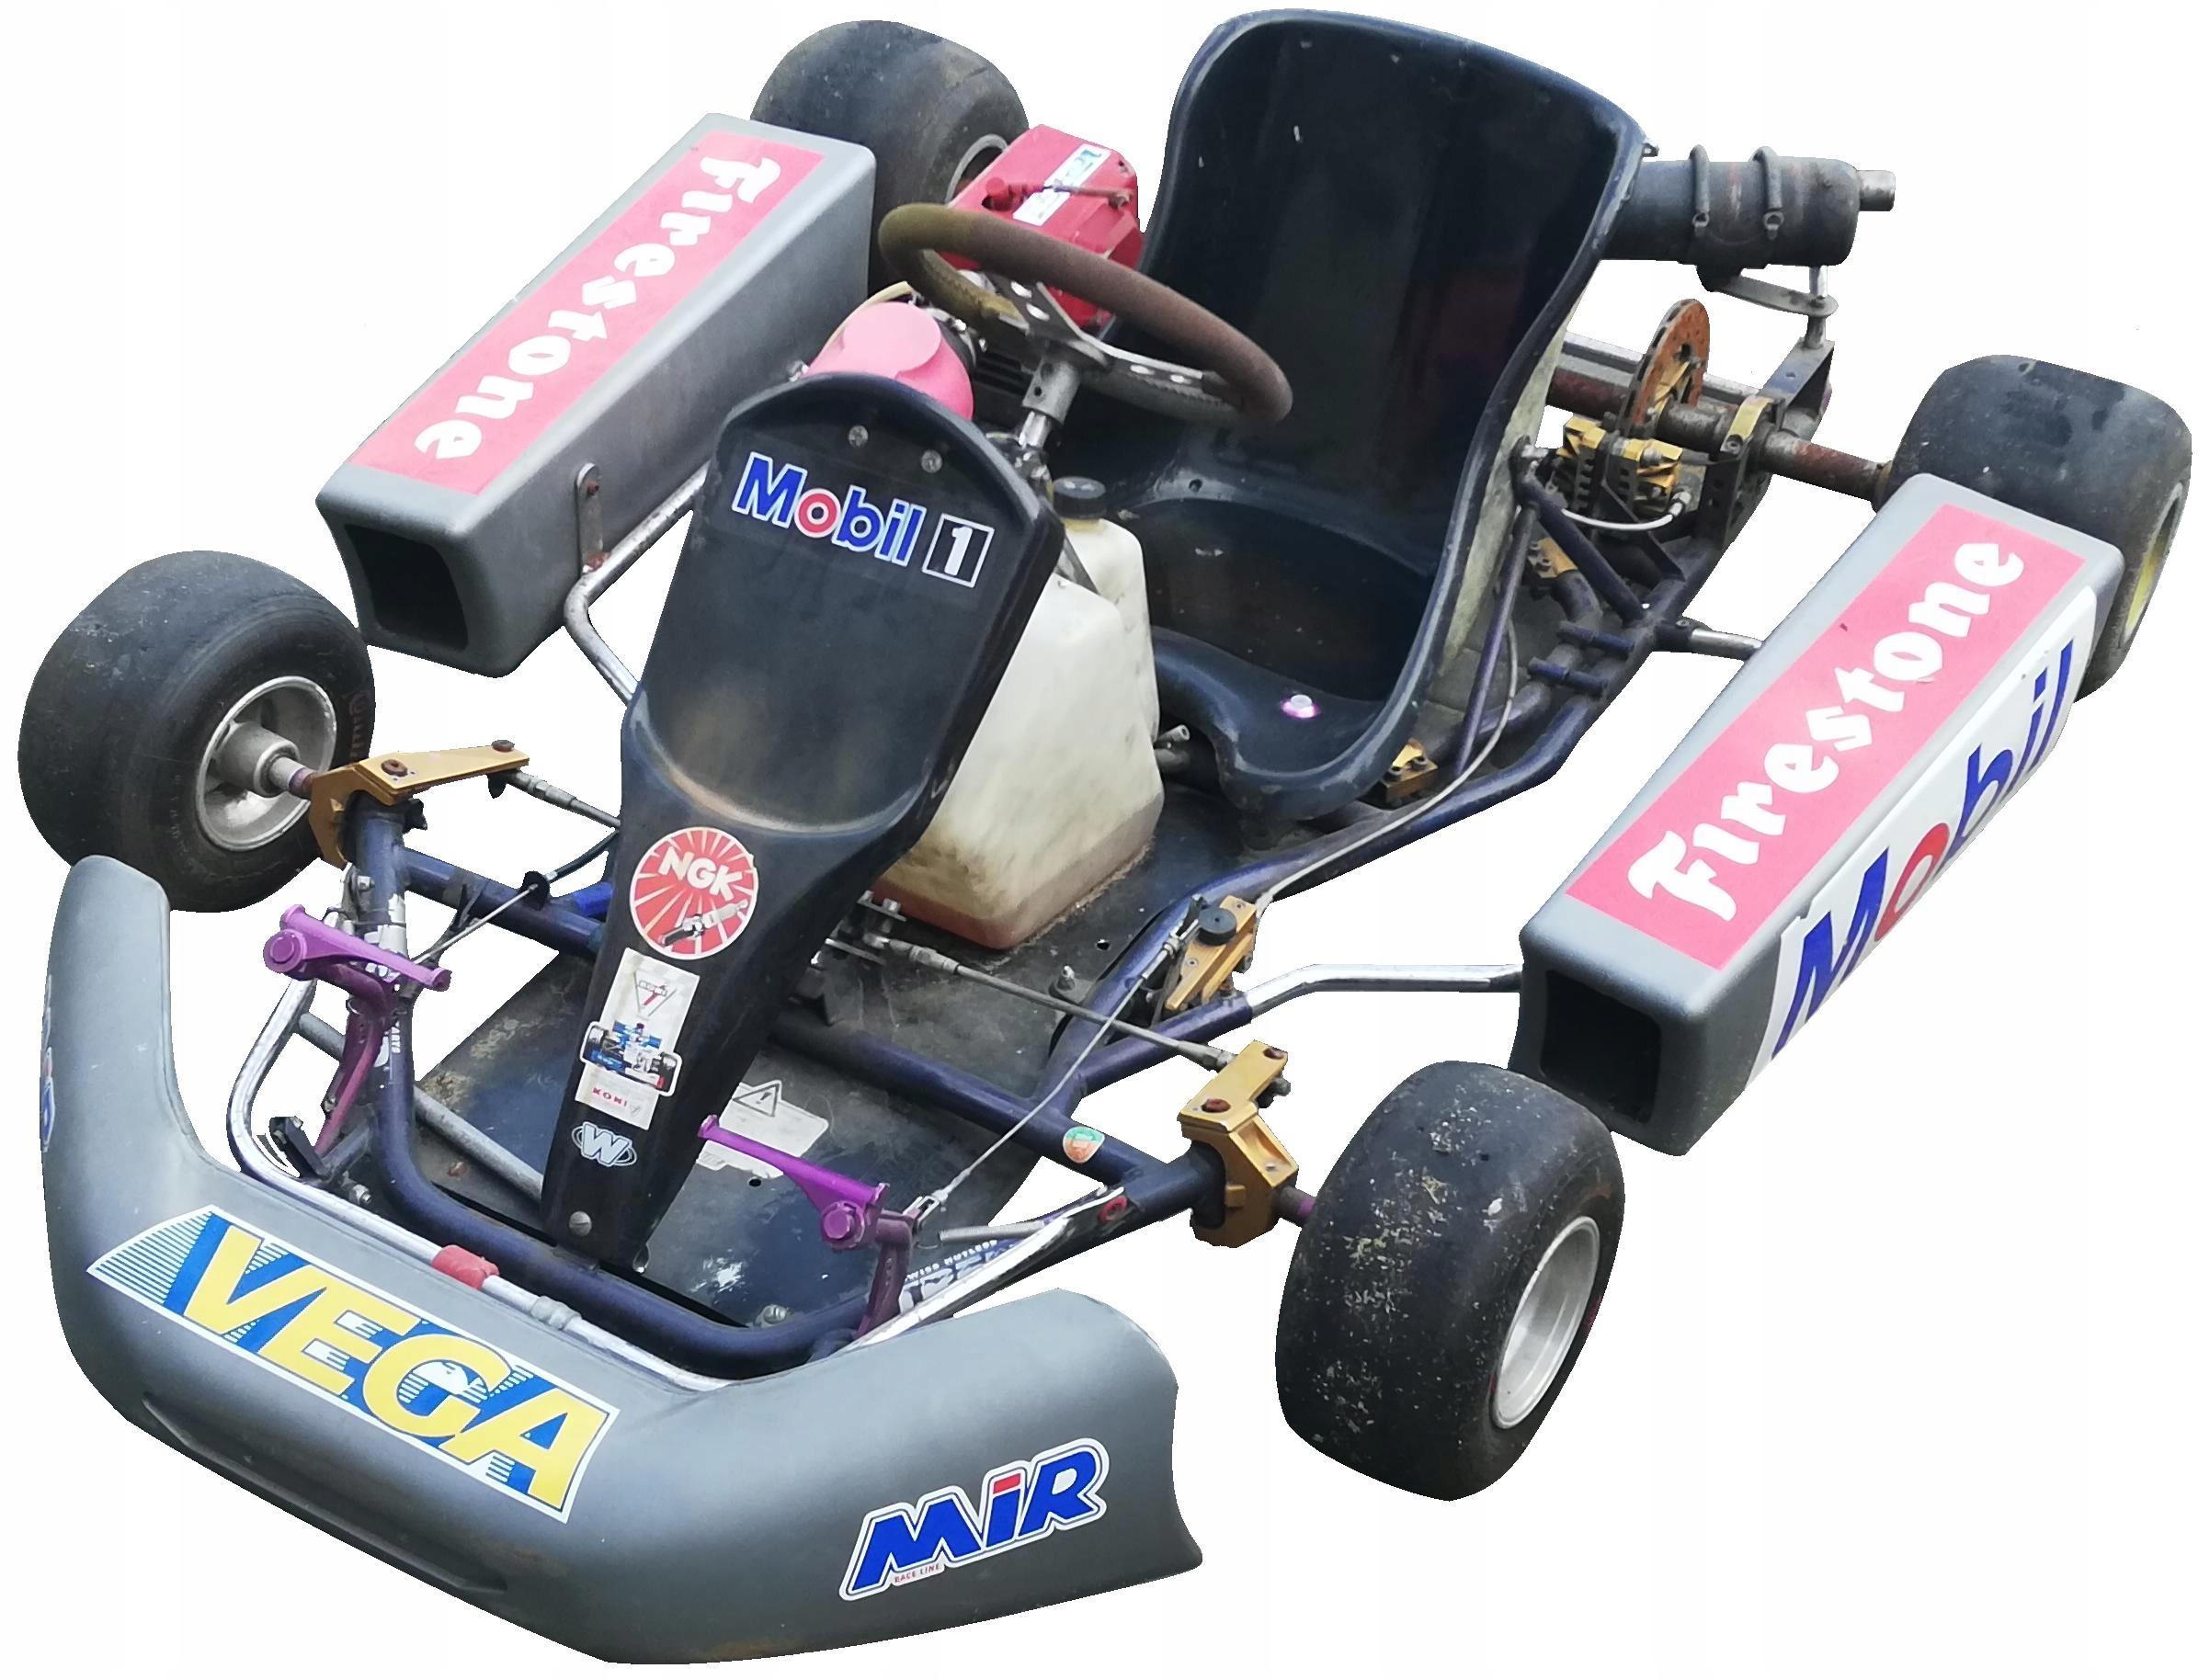 Сжигание картинг Comer Karting